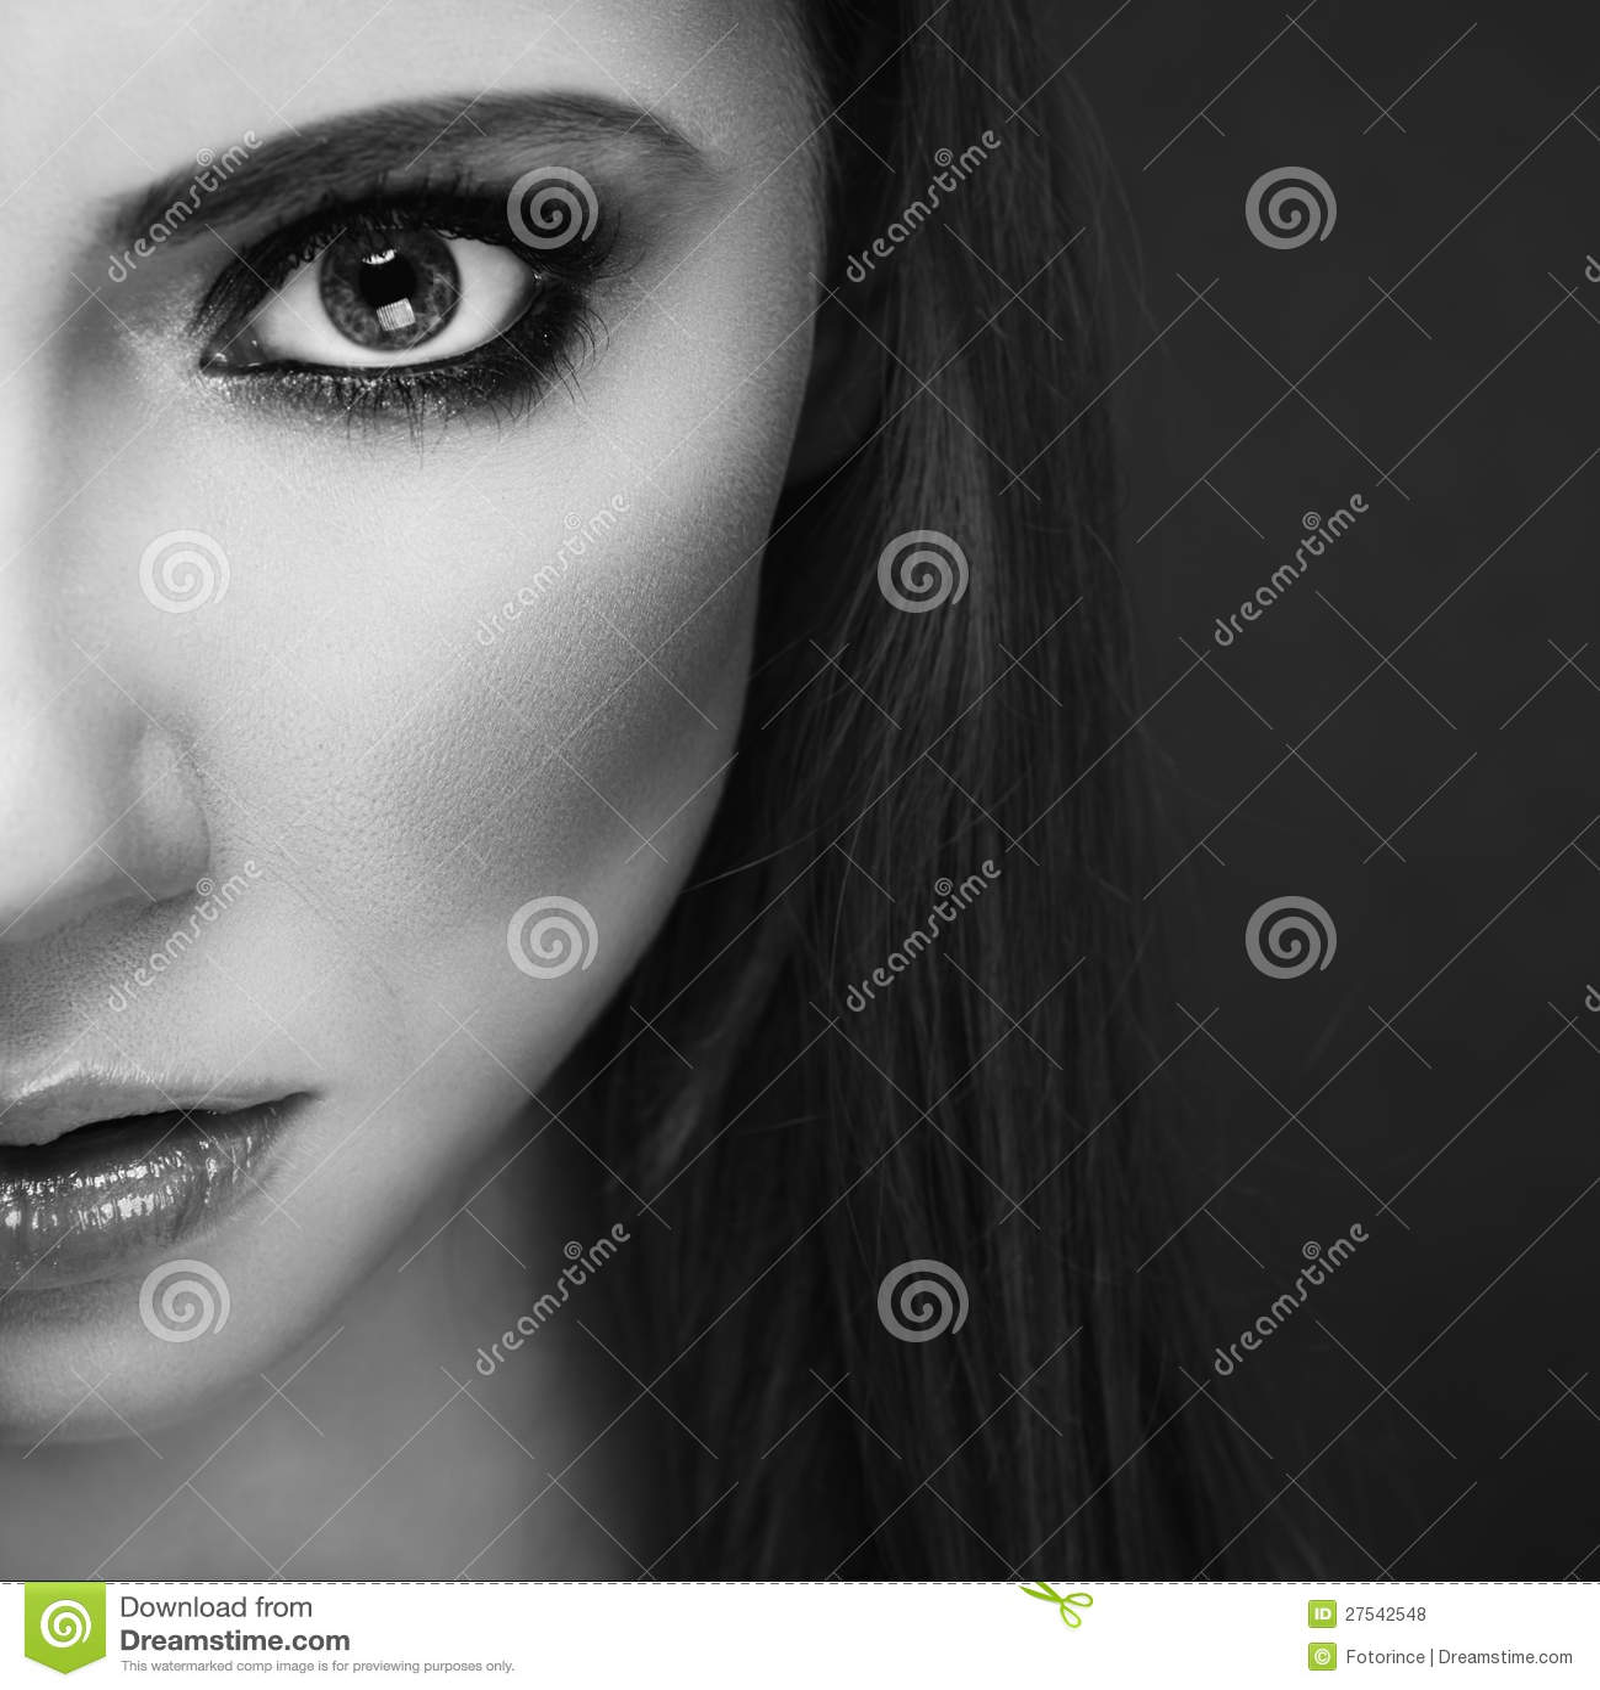 Half Face Portrait Stock Photo Image Of Eyebrow Skincare